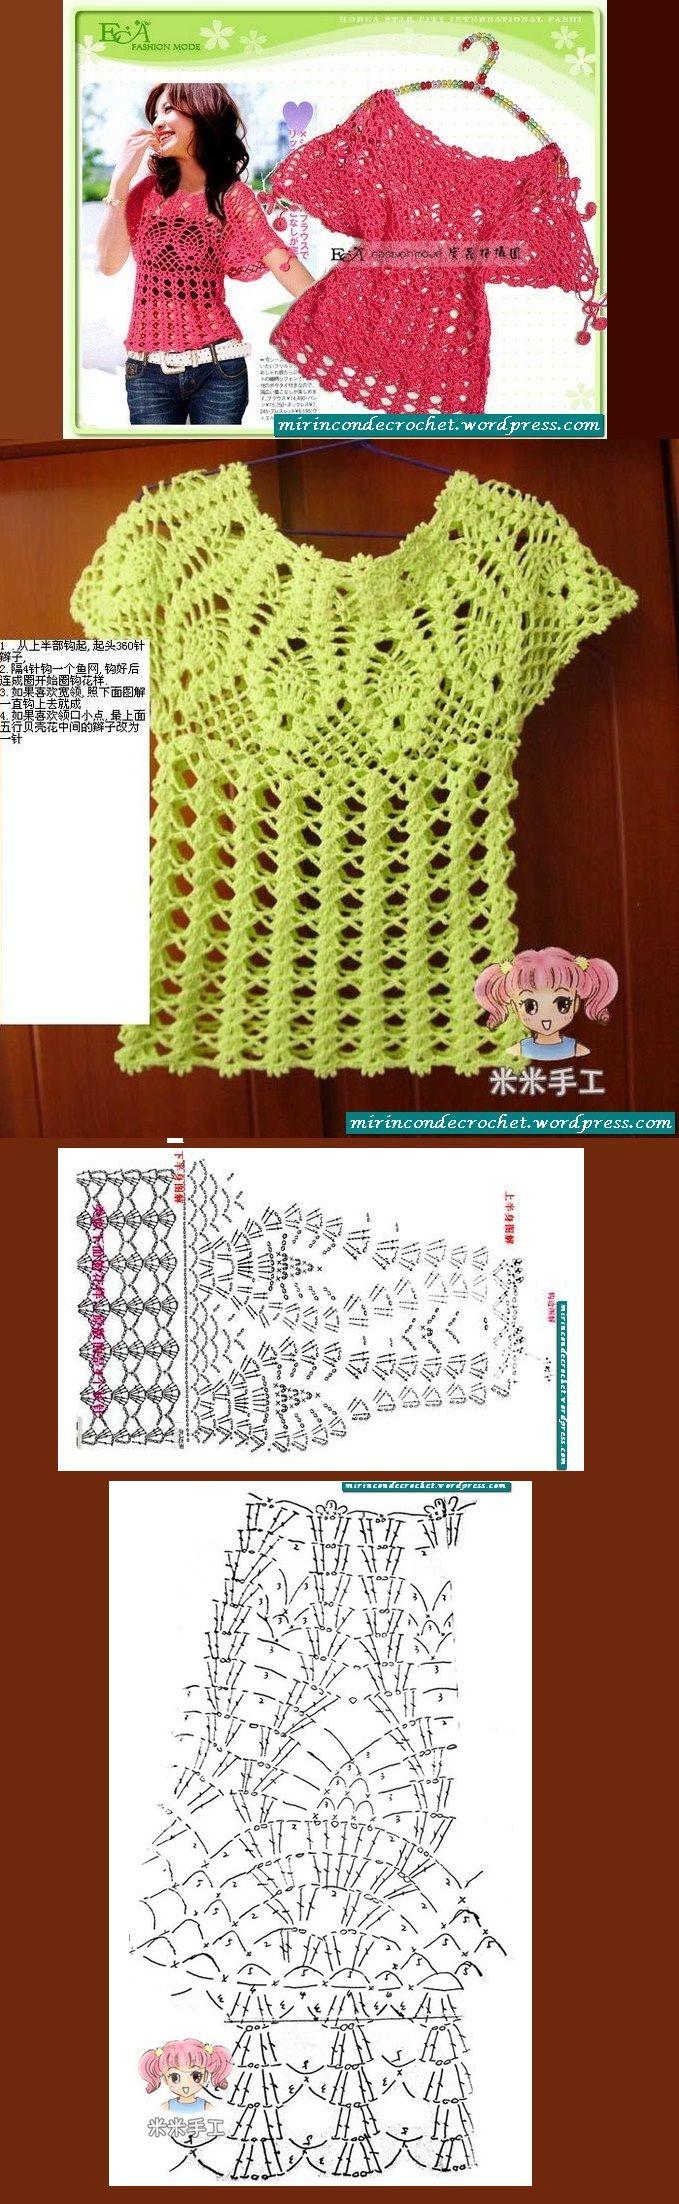 Blusa encantadora., #free #crochet #pattern <3ceruleana<3